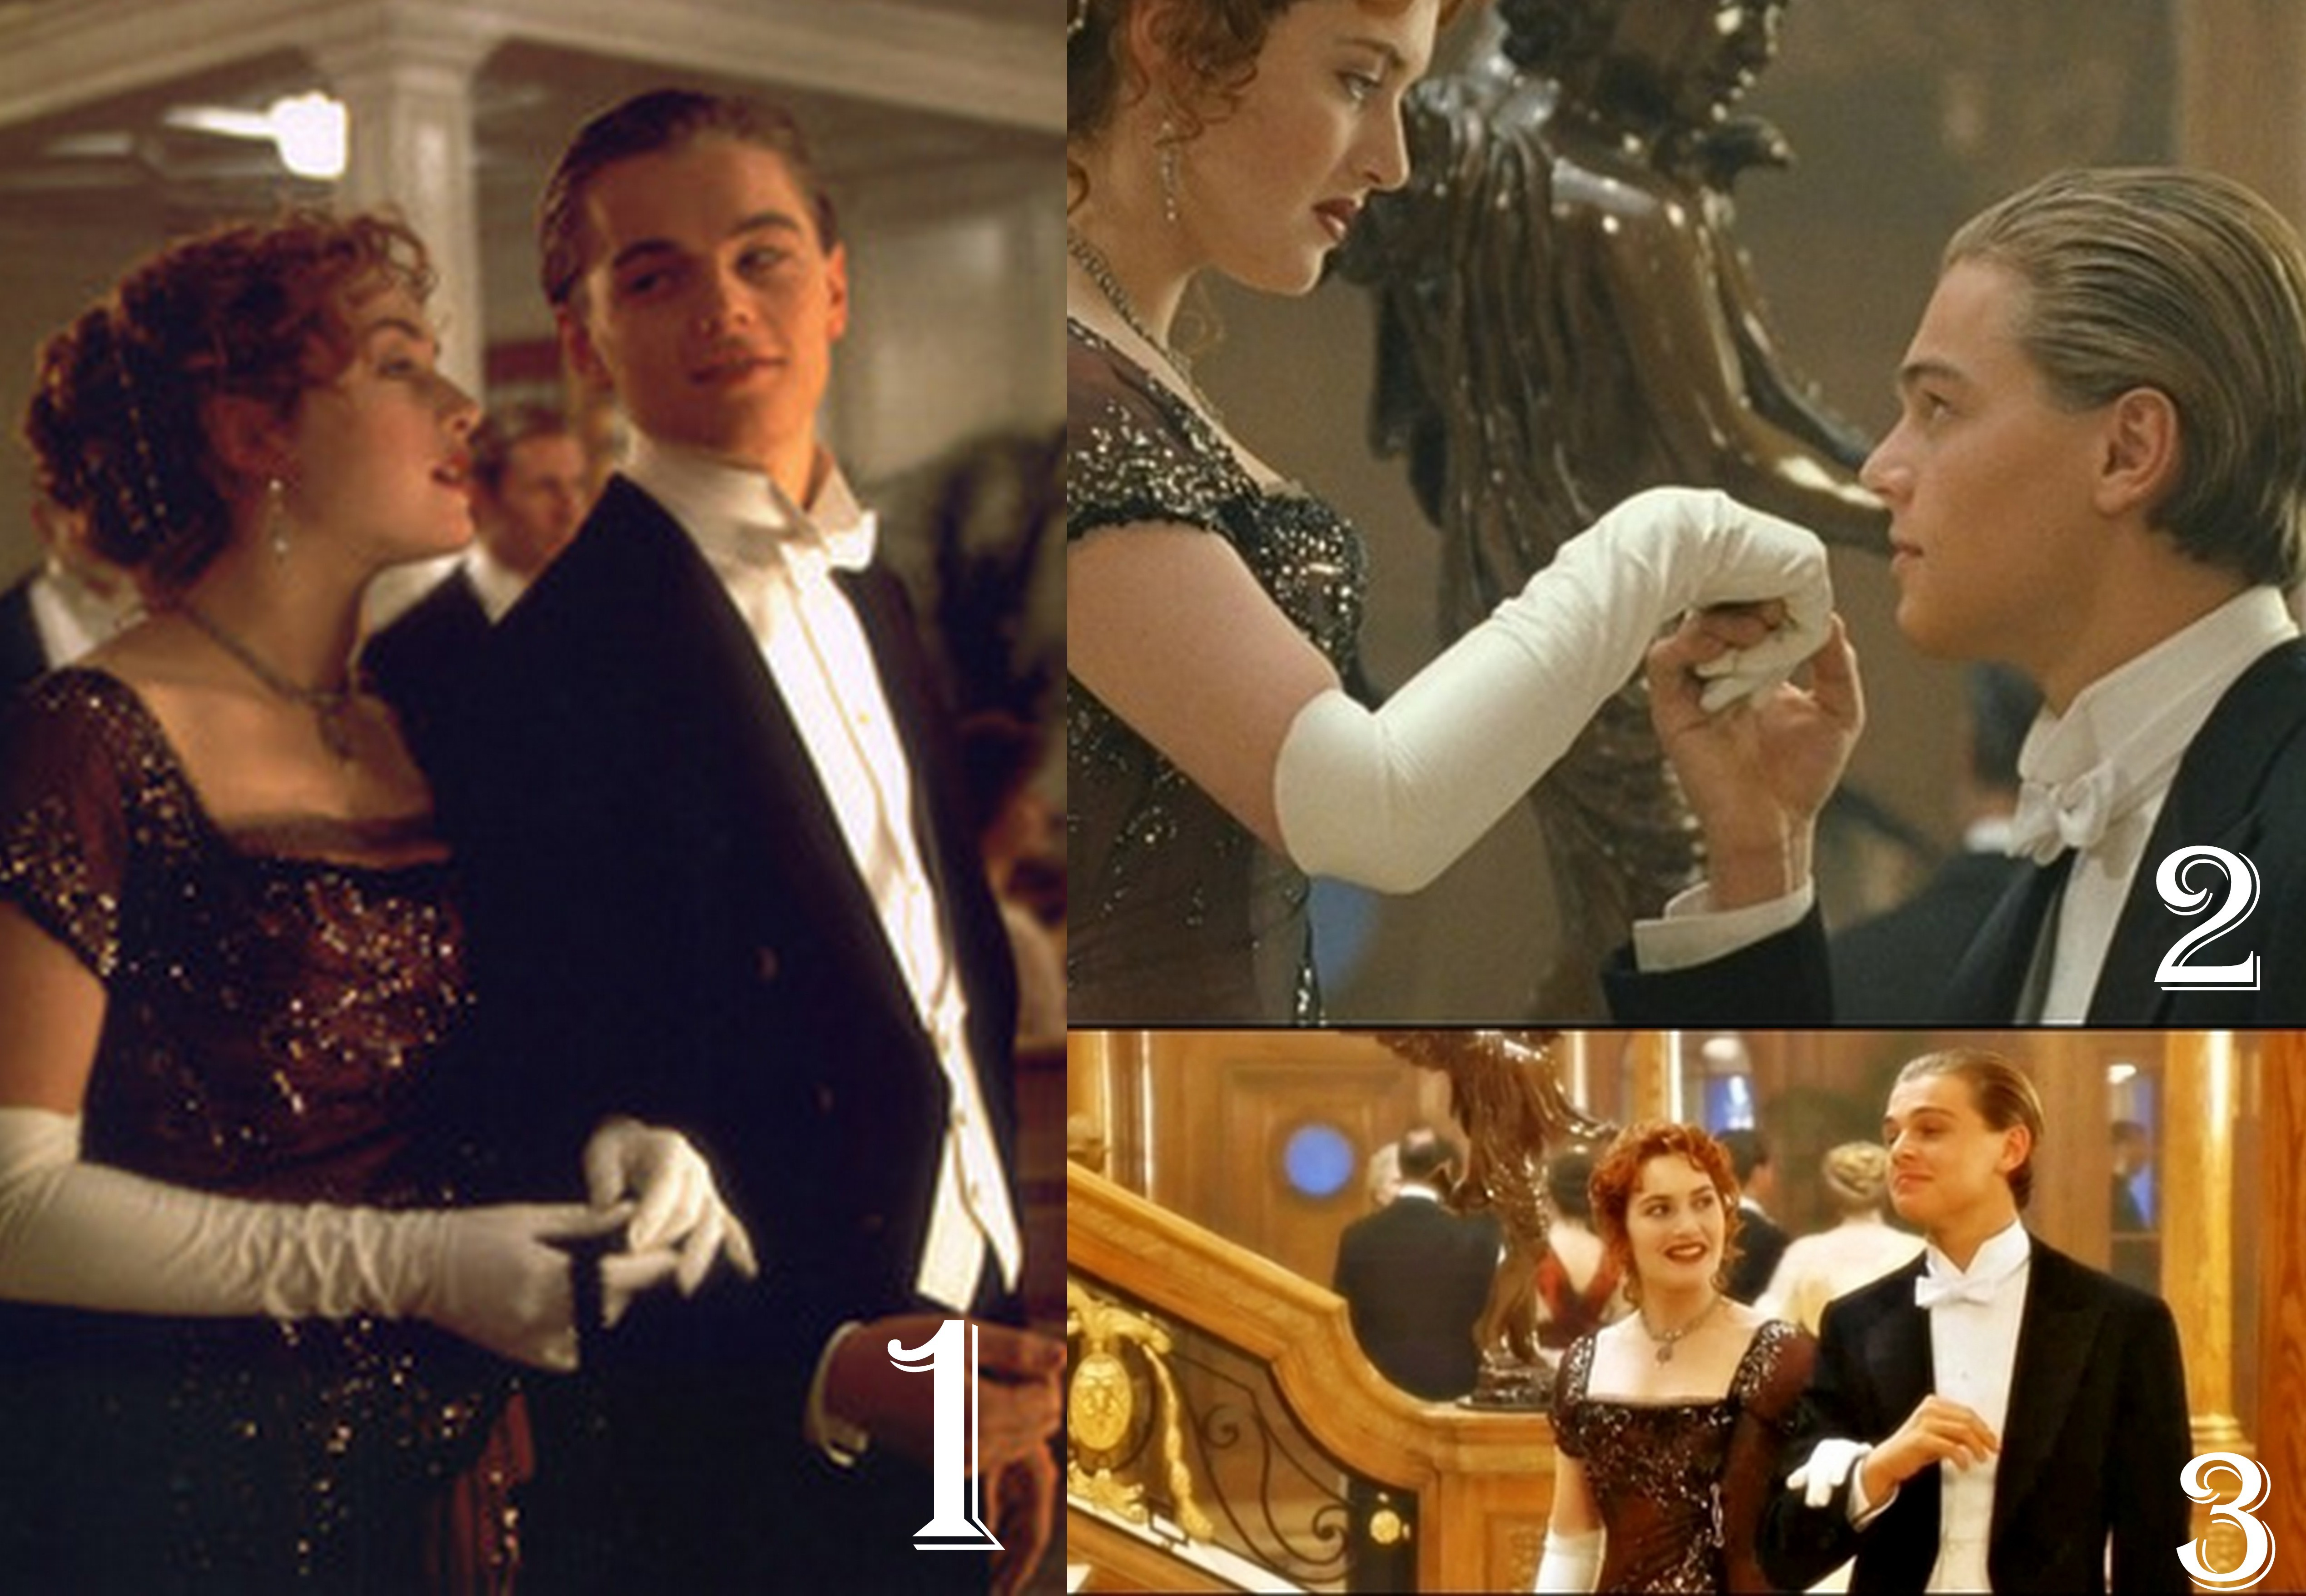 Winner List in Titanic Photo Competetion - Titanic - Fanpop